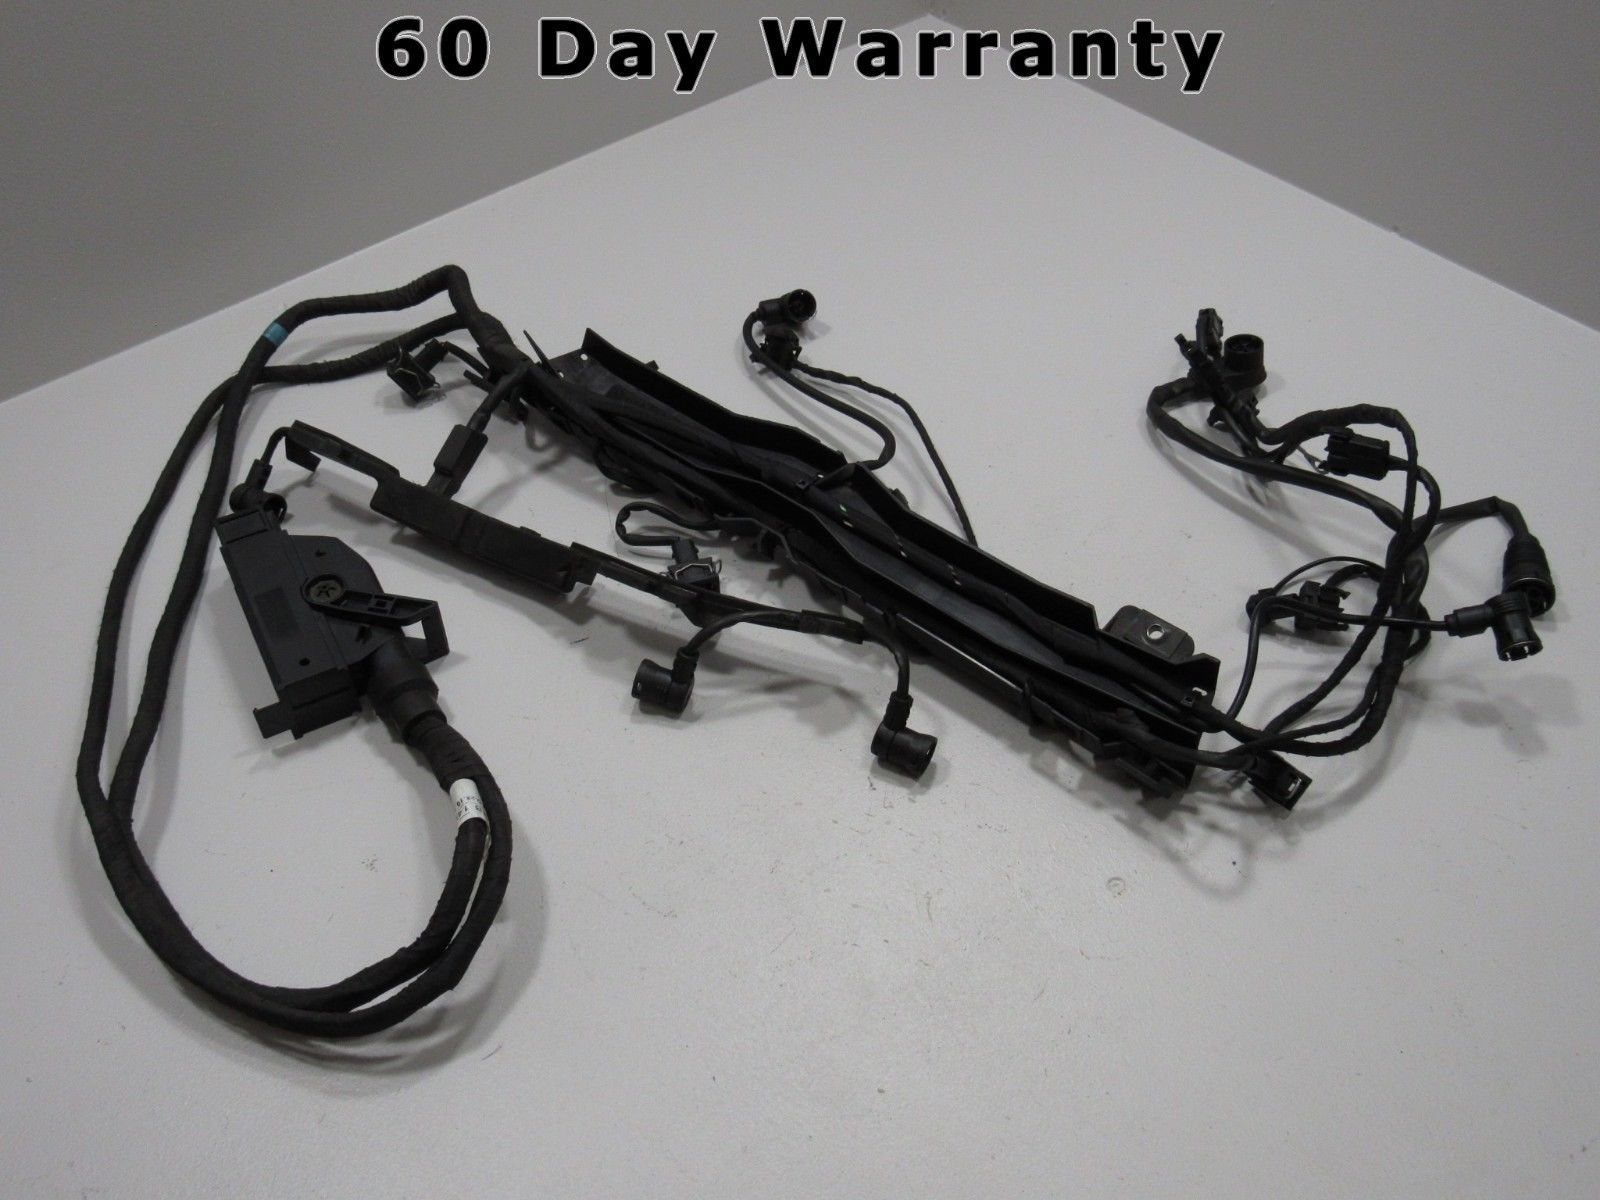 hight resolution of 94 95 mercedes sl320 s320 2006 update engine wire wiring harness 140 540 69 32 b